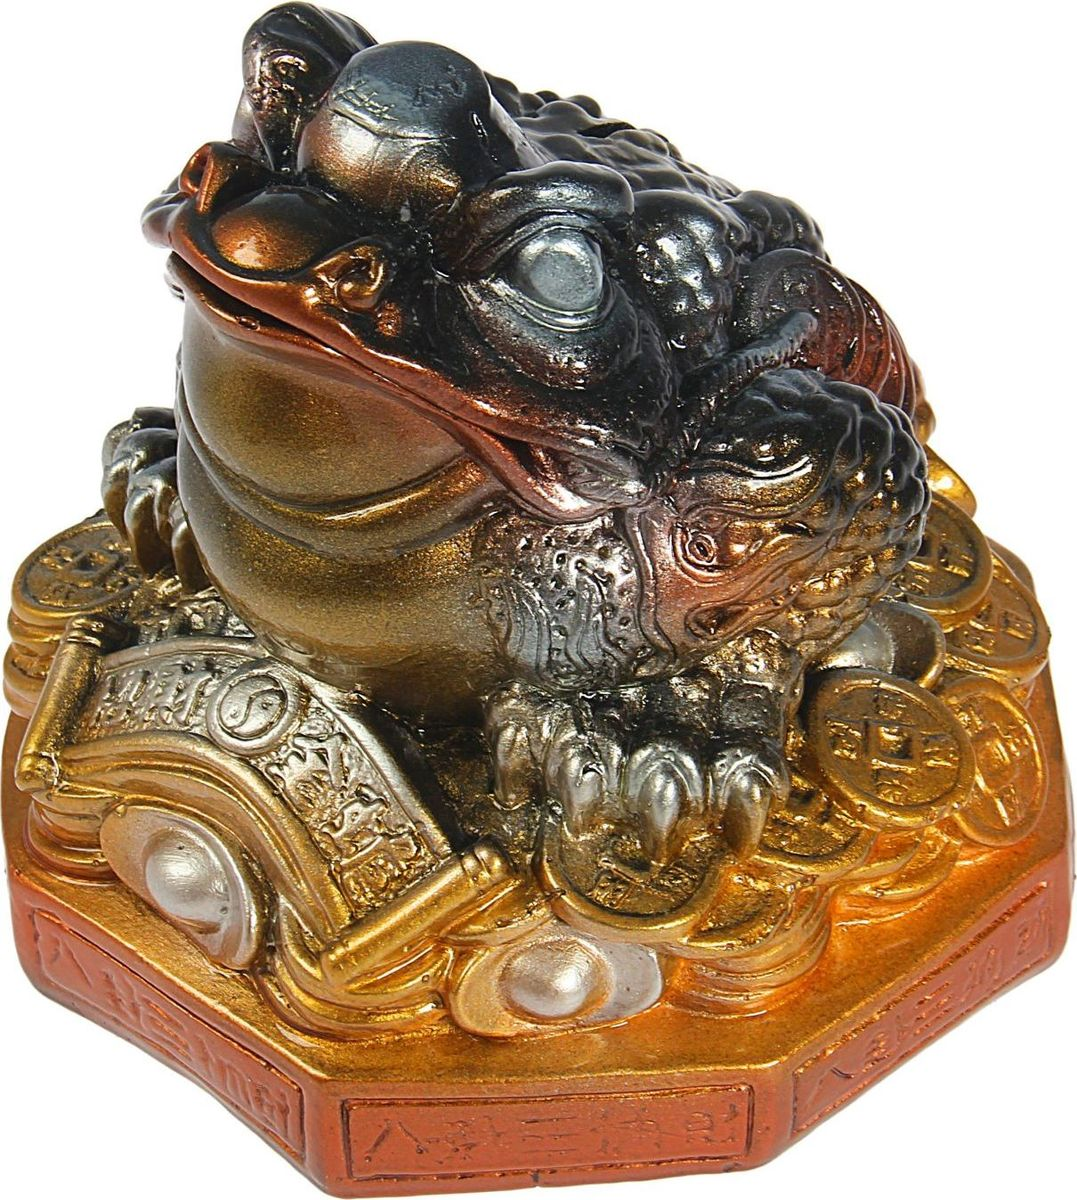 Копилка Premium Gips Денежная жаба, 17 х 17 х 18 см копилка premium gips денежная жаба 17 см х 19 см х 17 см